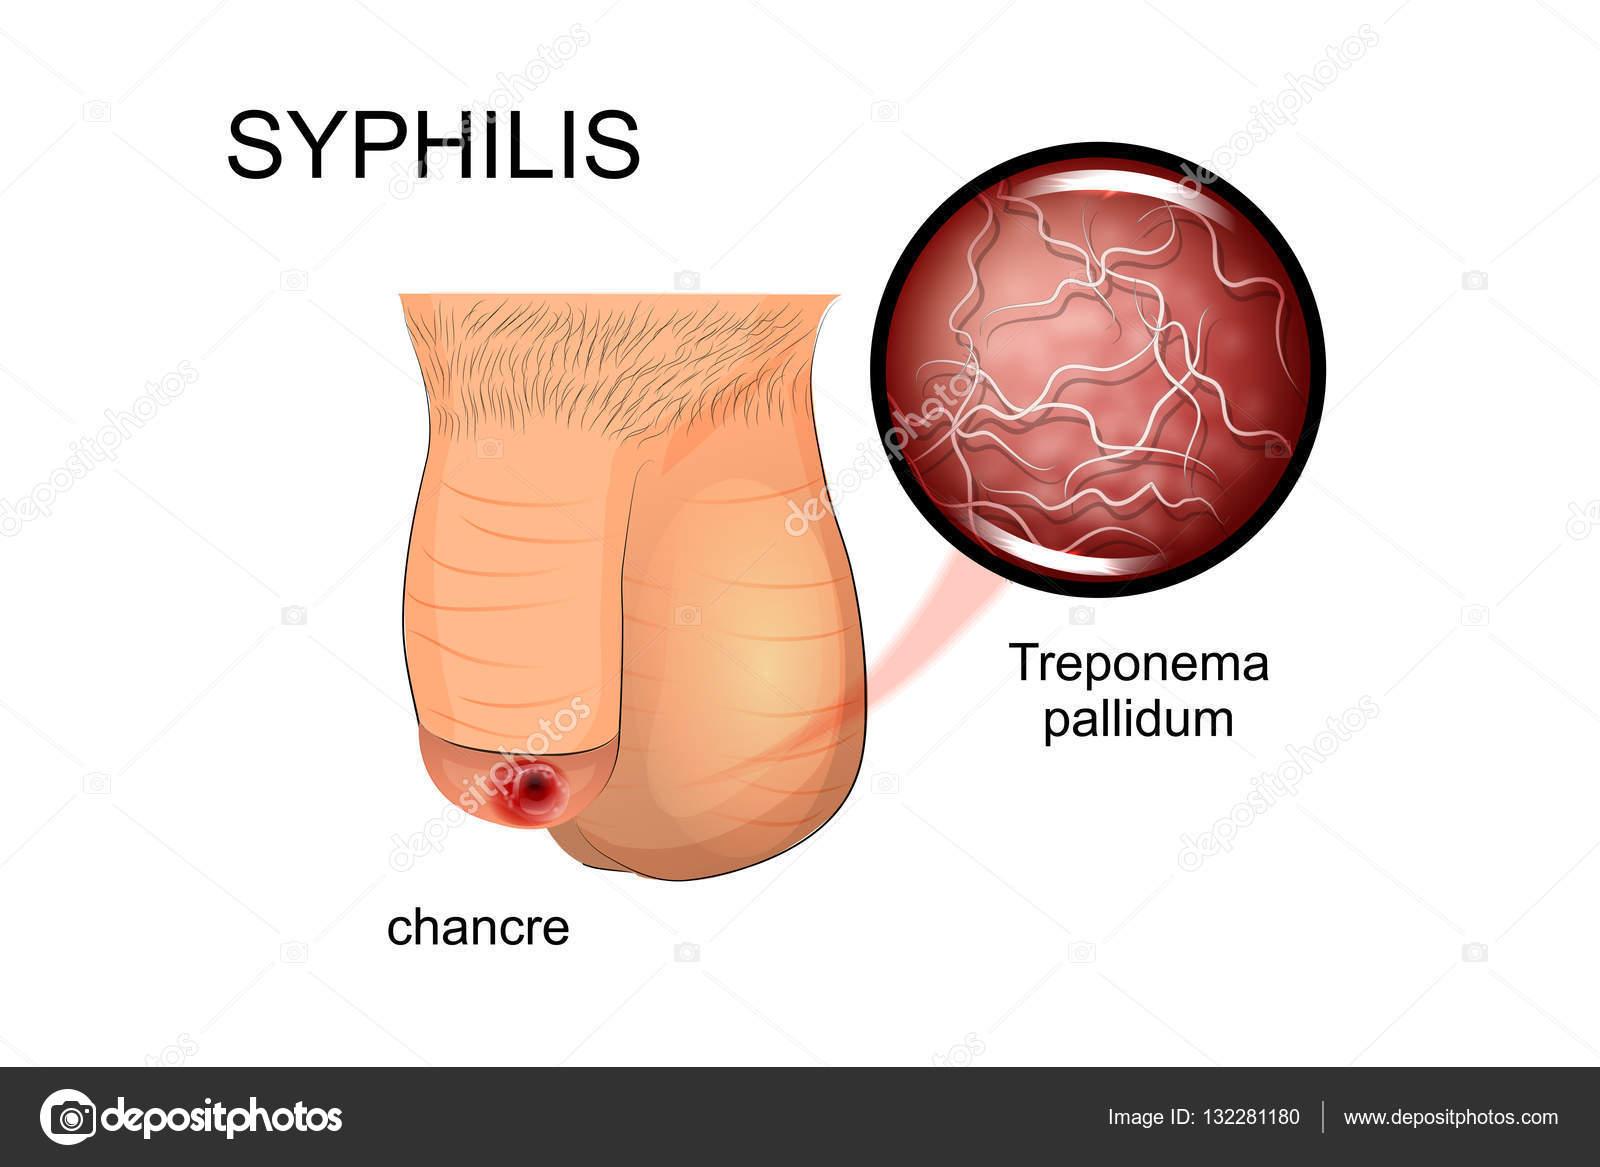 Syphilis Pathogen Chancre Stock Vector C Artemida Psy 132281180